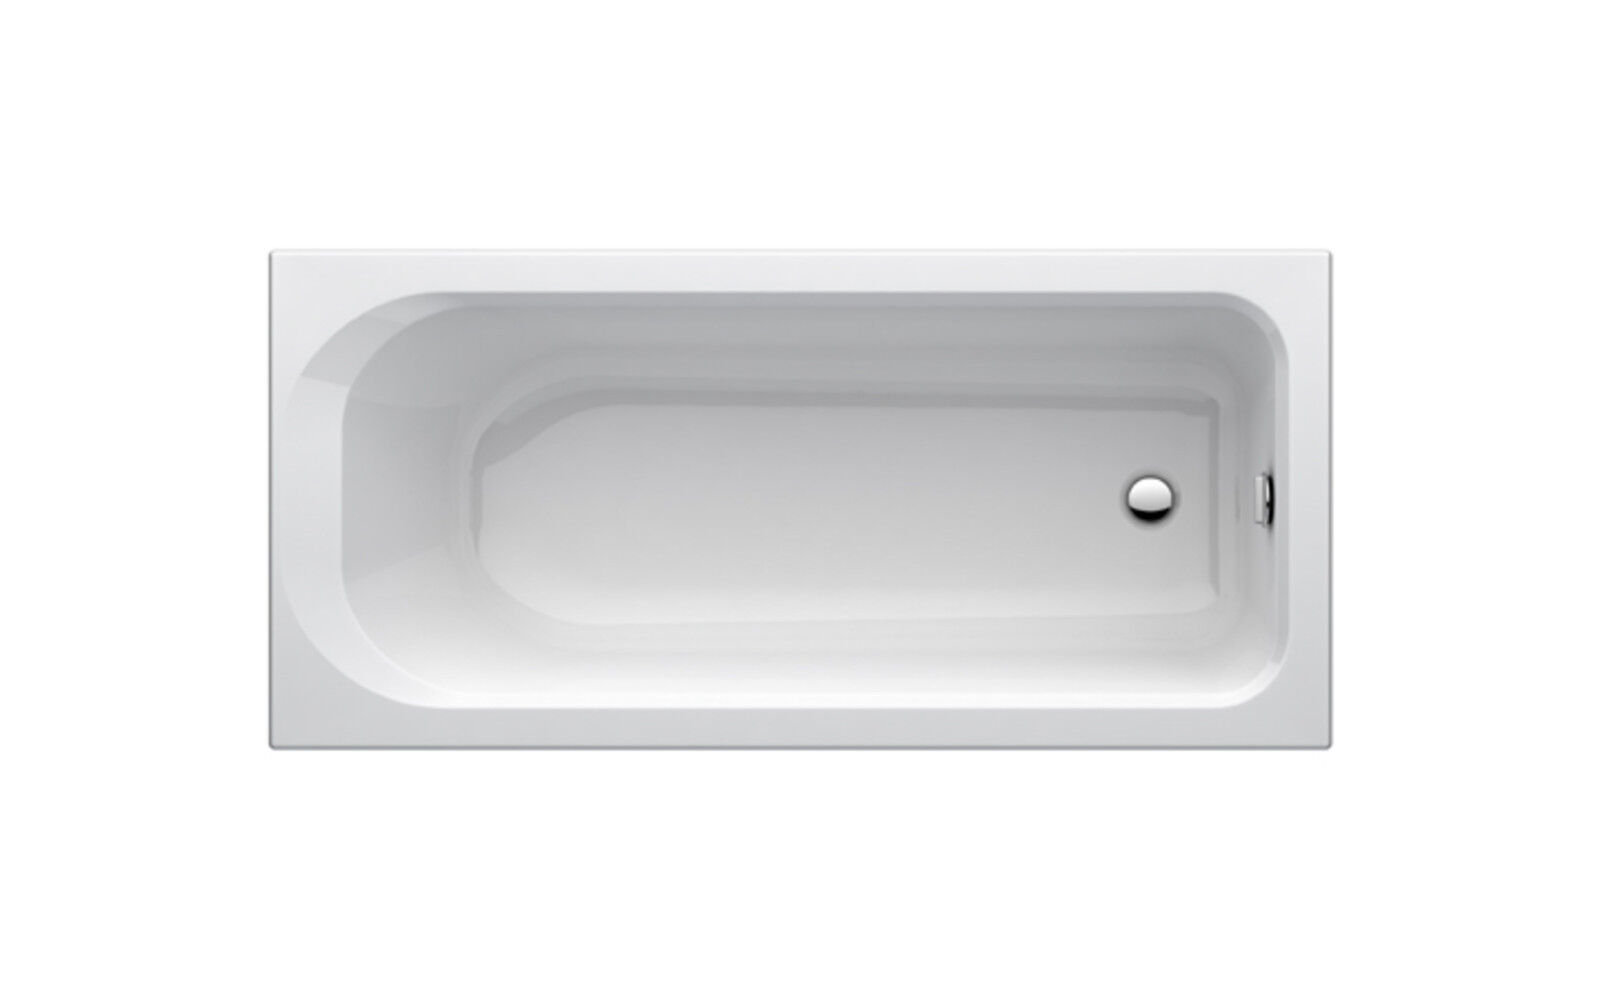 Acryl Badewanne 170 x 70  weiß  Vigour ONE  Lagerware